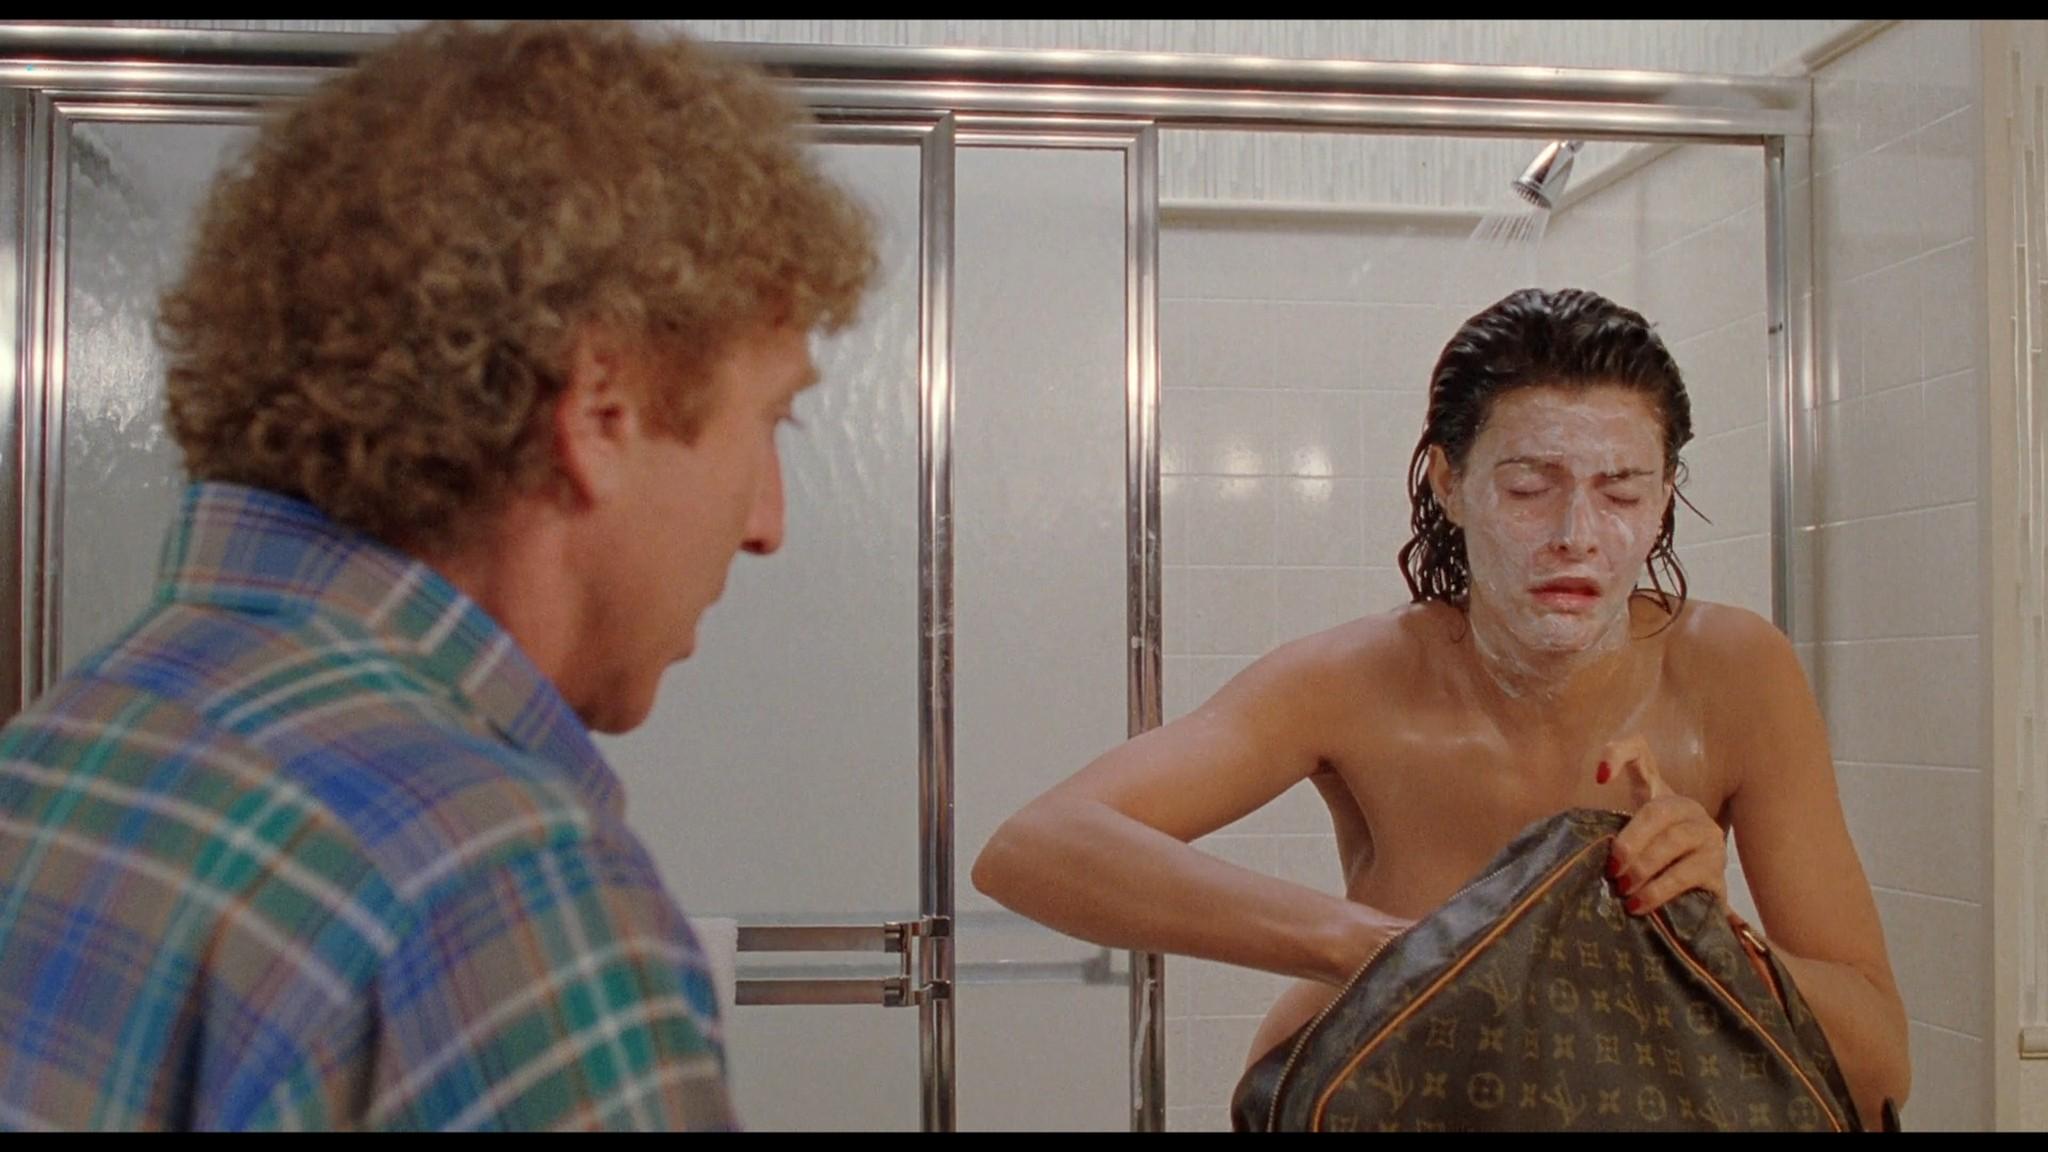 Joan Severance nude topless - See No Evil Hear No Evil (1989) HD 720/1080p (6)